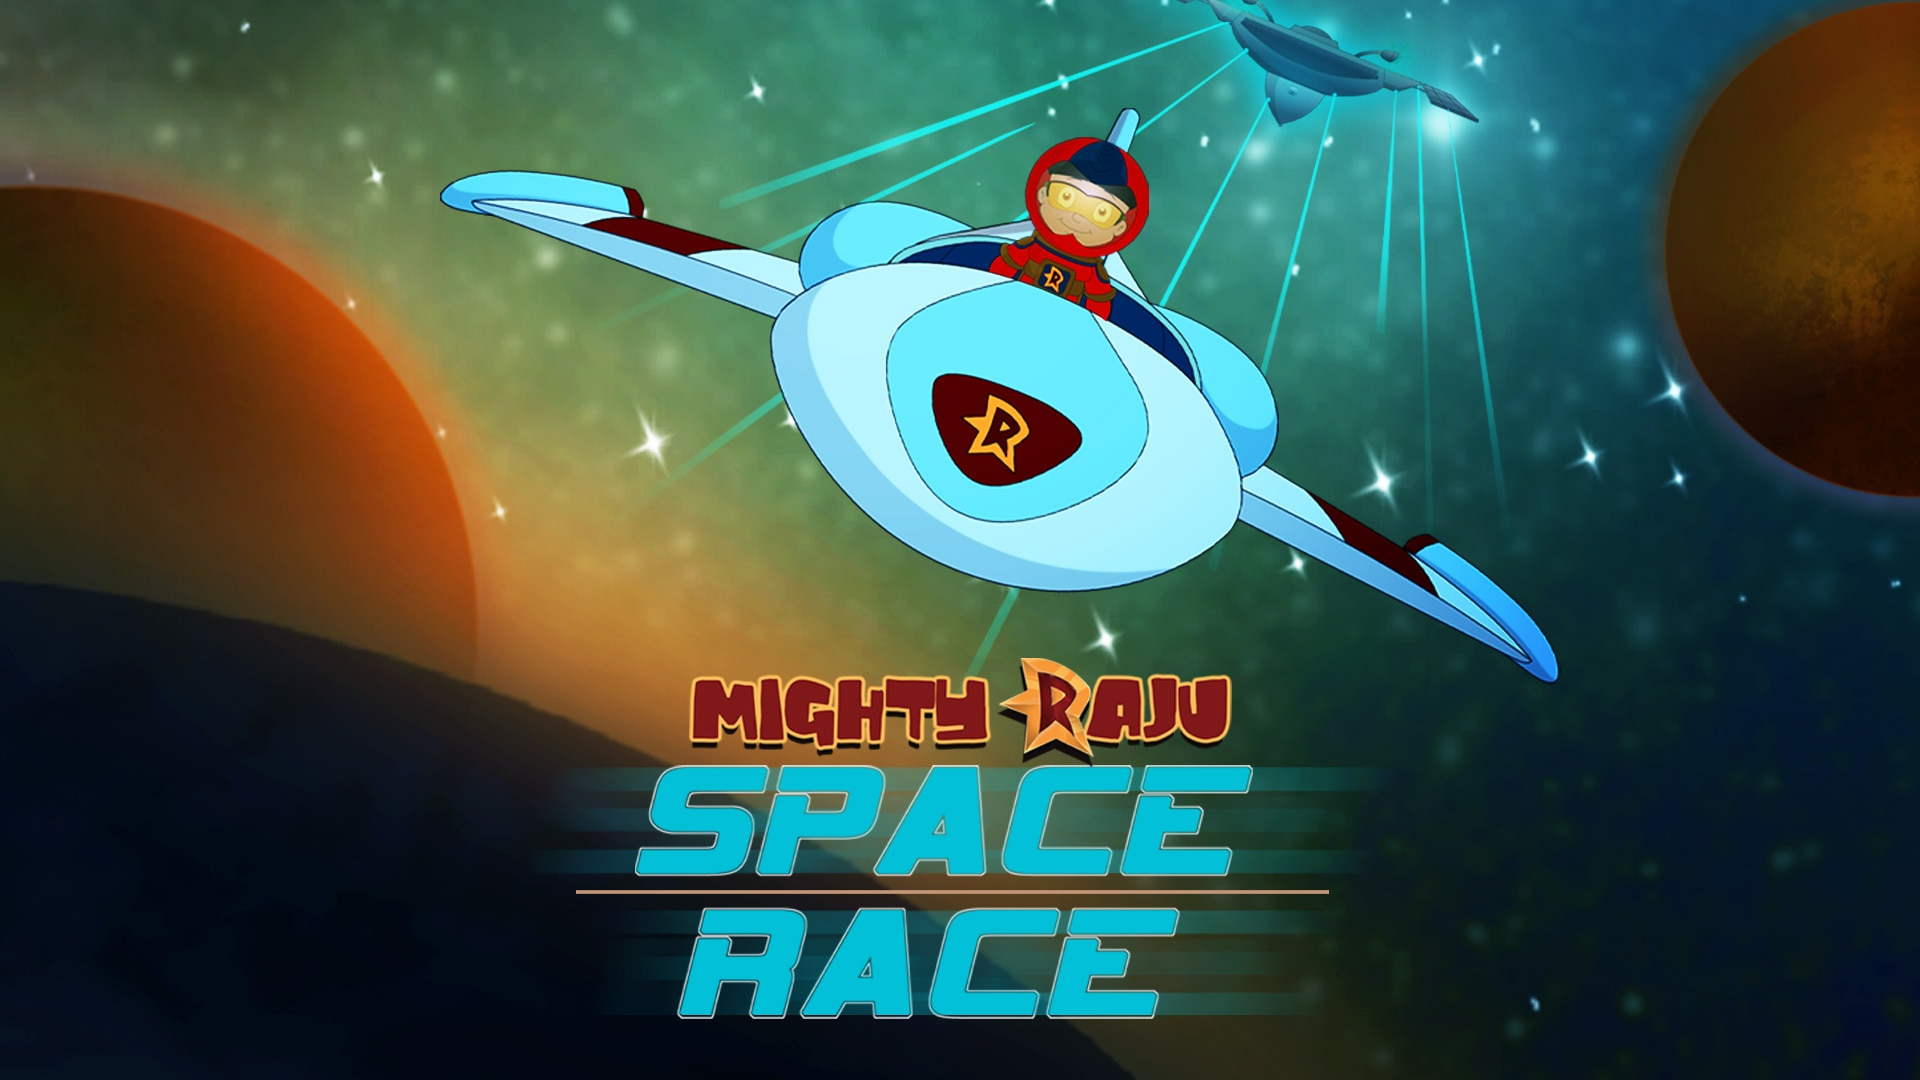 Mighty Raju Space Race Full Movie In Telugu